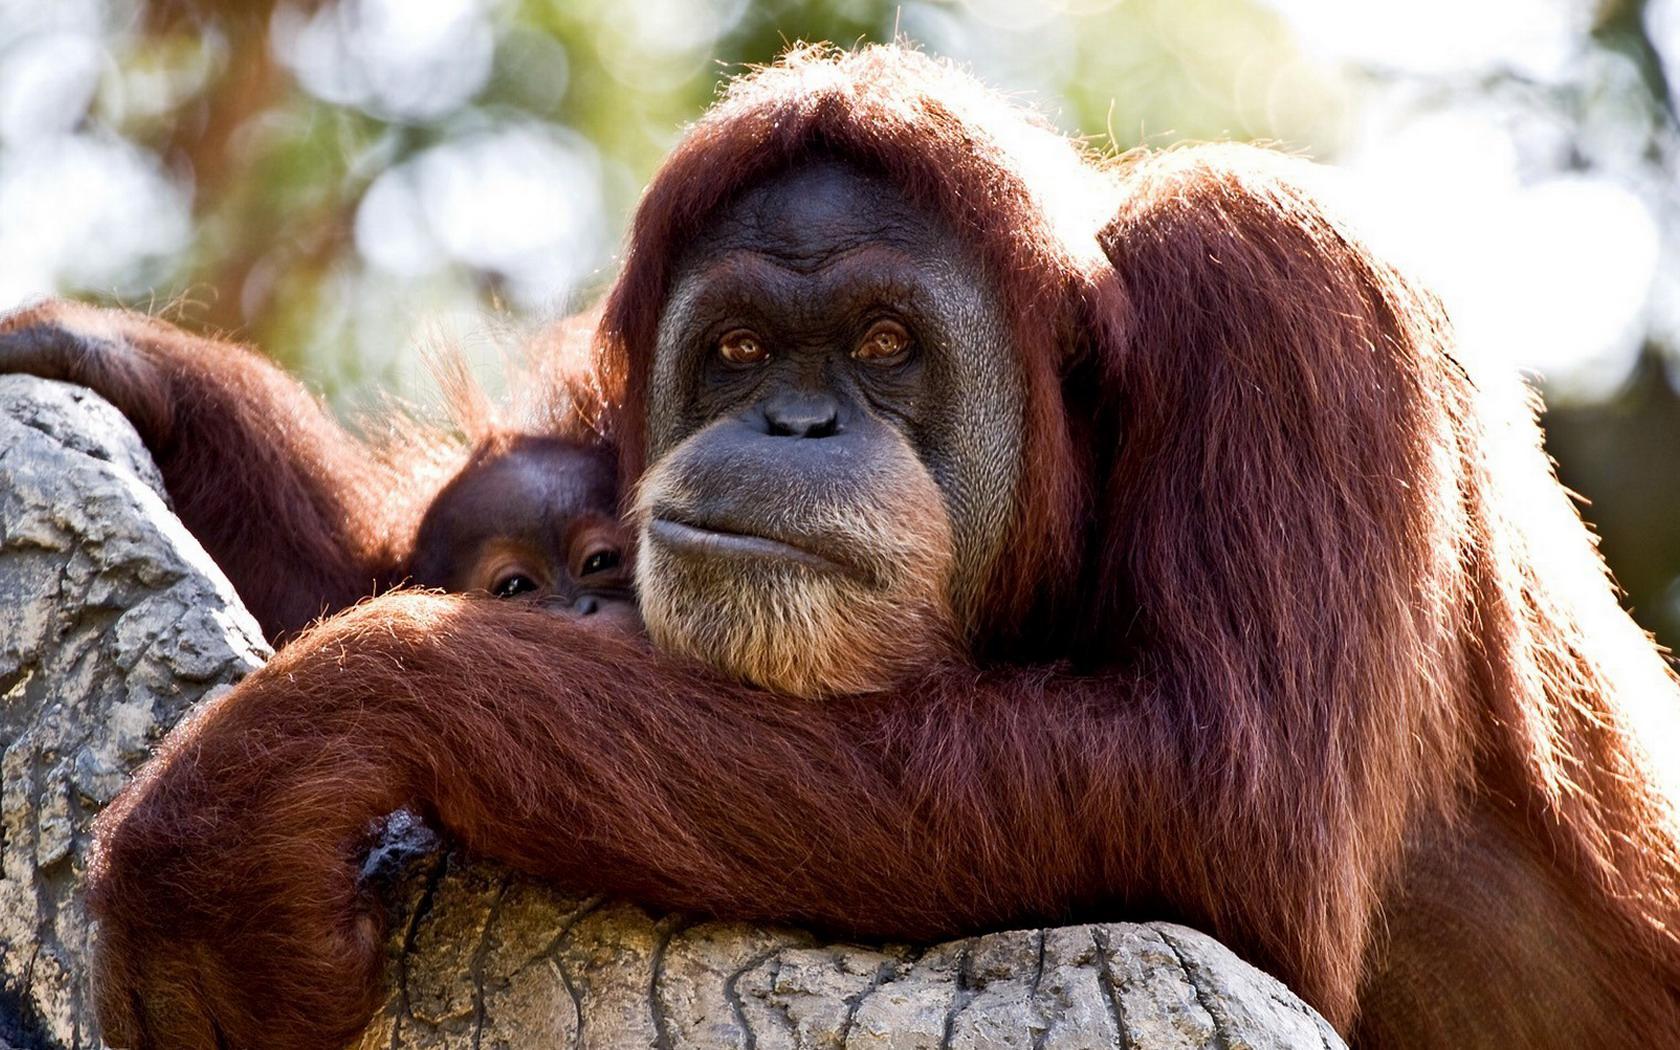 Orangutan Wallpaper And Background Image 1680x1050 Id356085